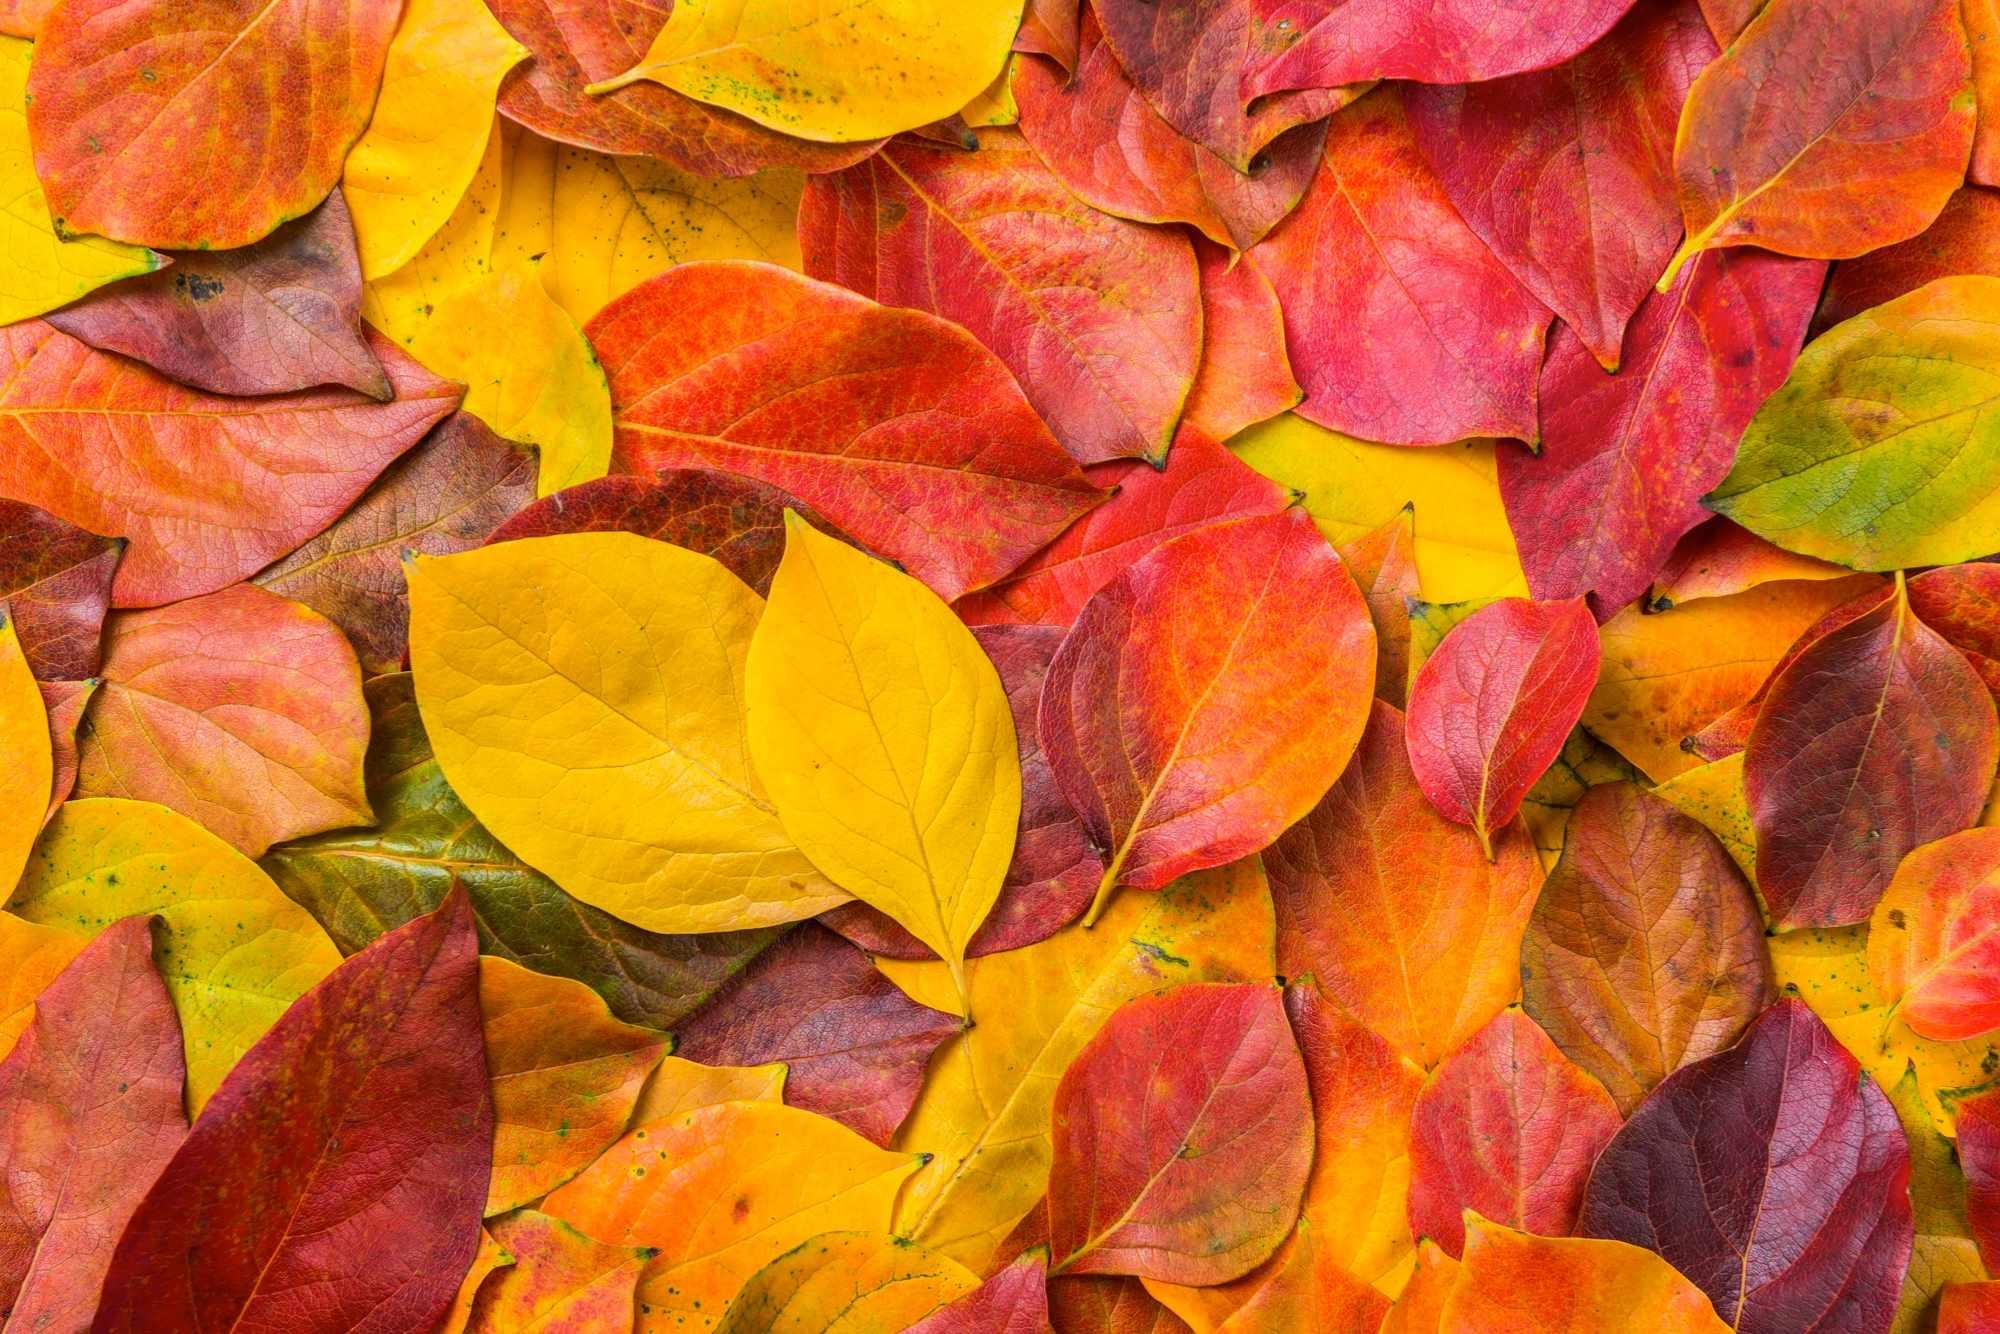 Autumn leaves © Kenan Olgun / Getty